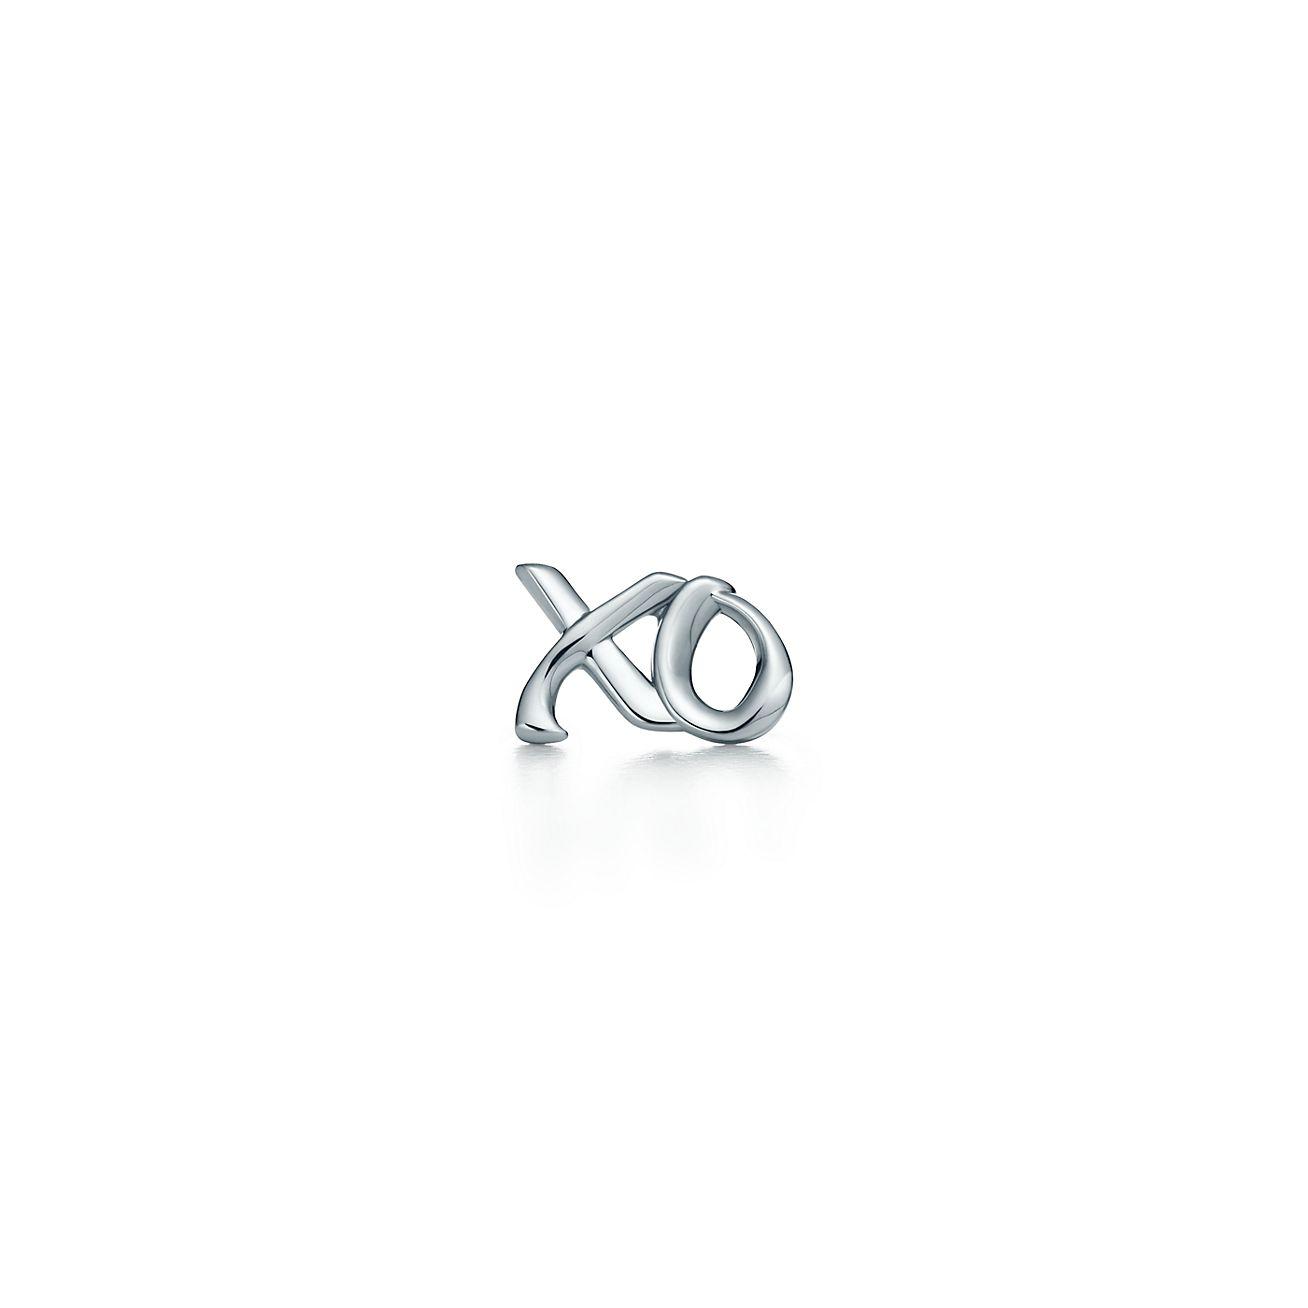 Palomas Graffiti love & kisses single earring in sterling silver Tiffany & Co.